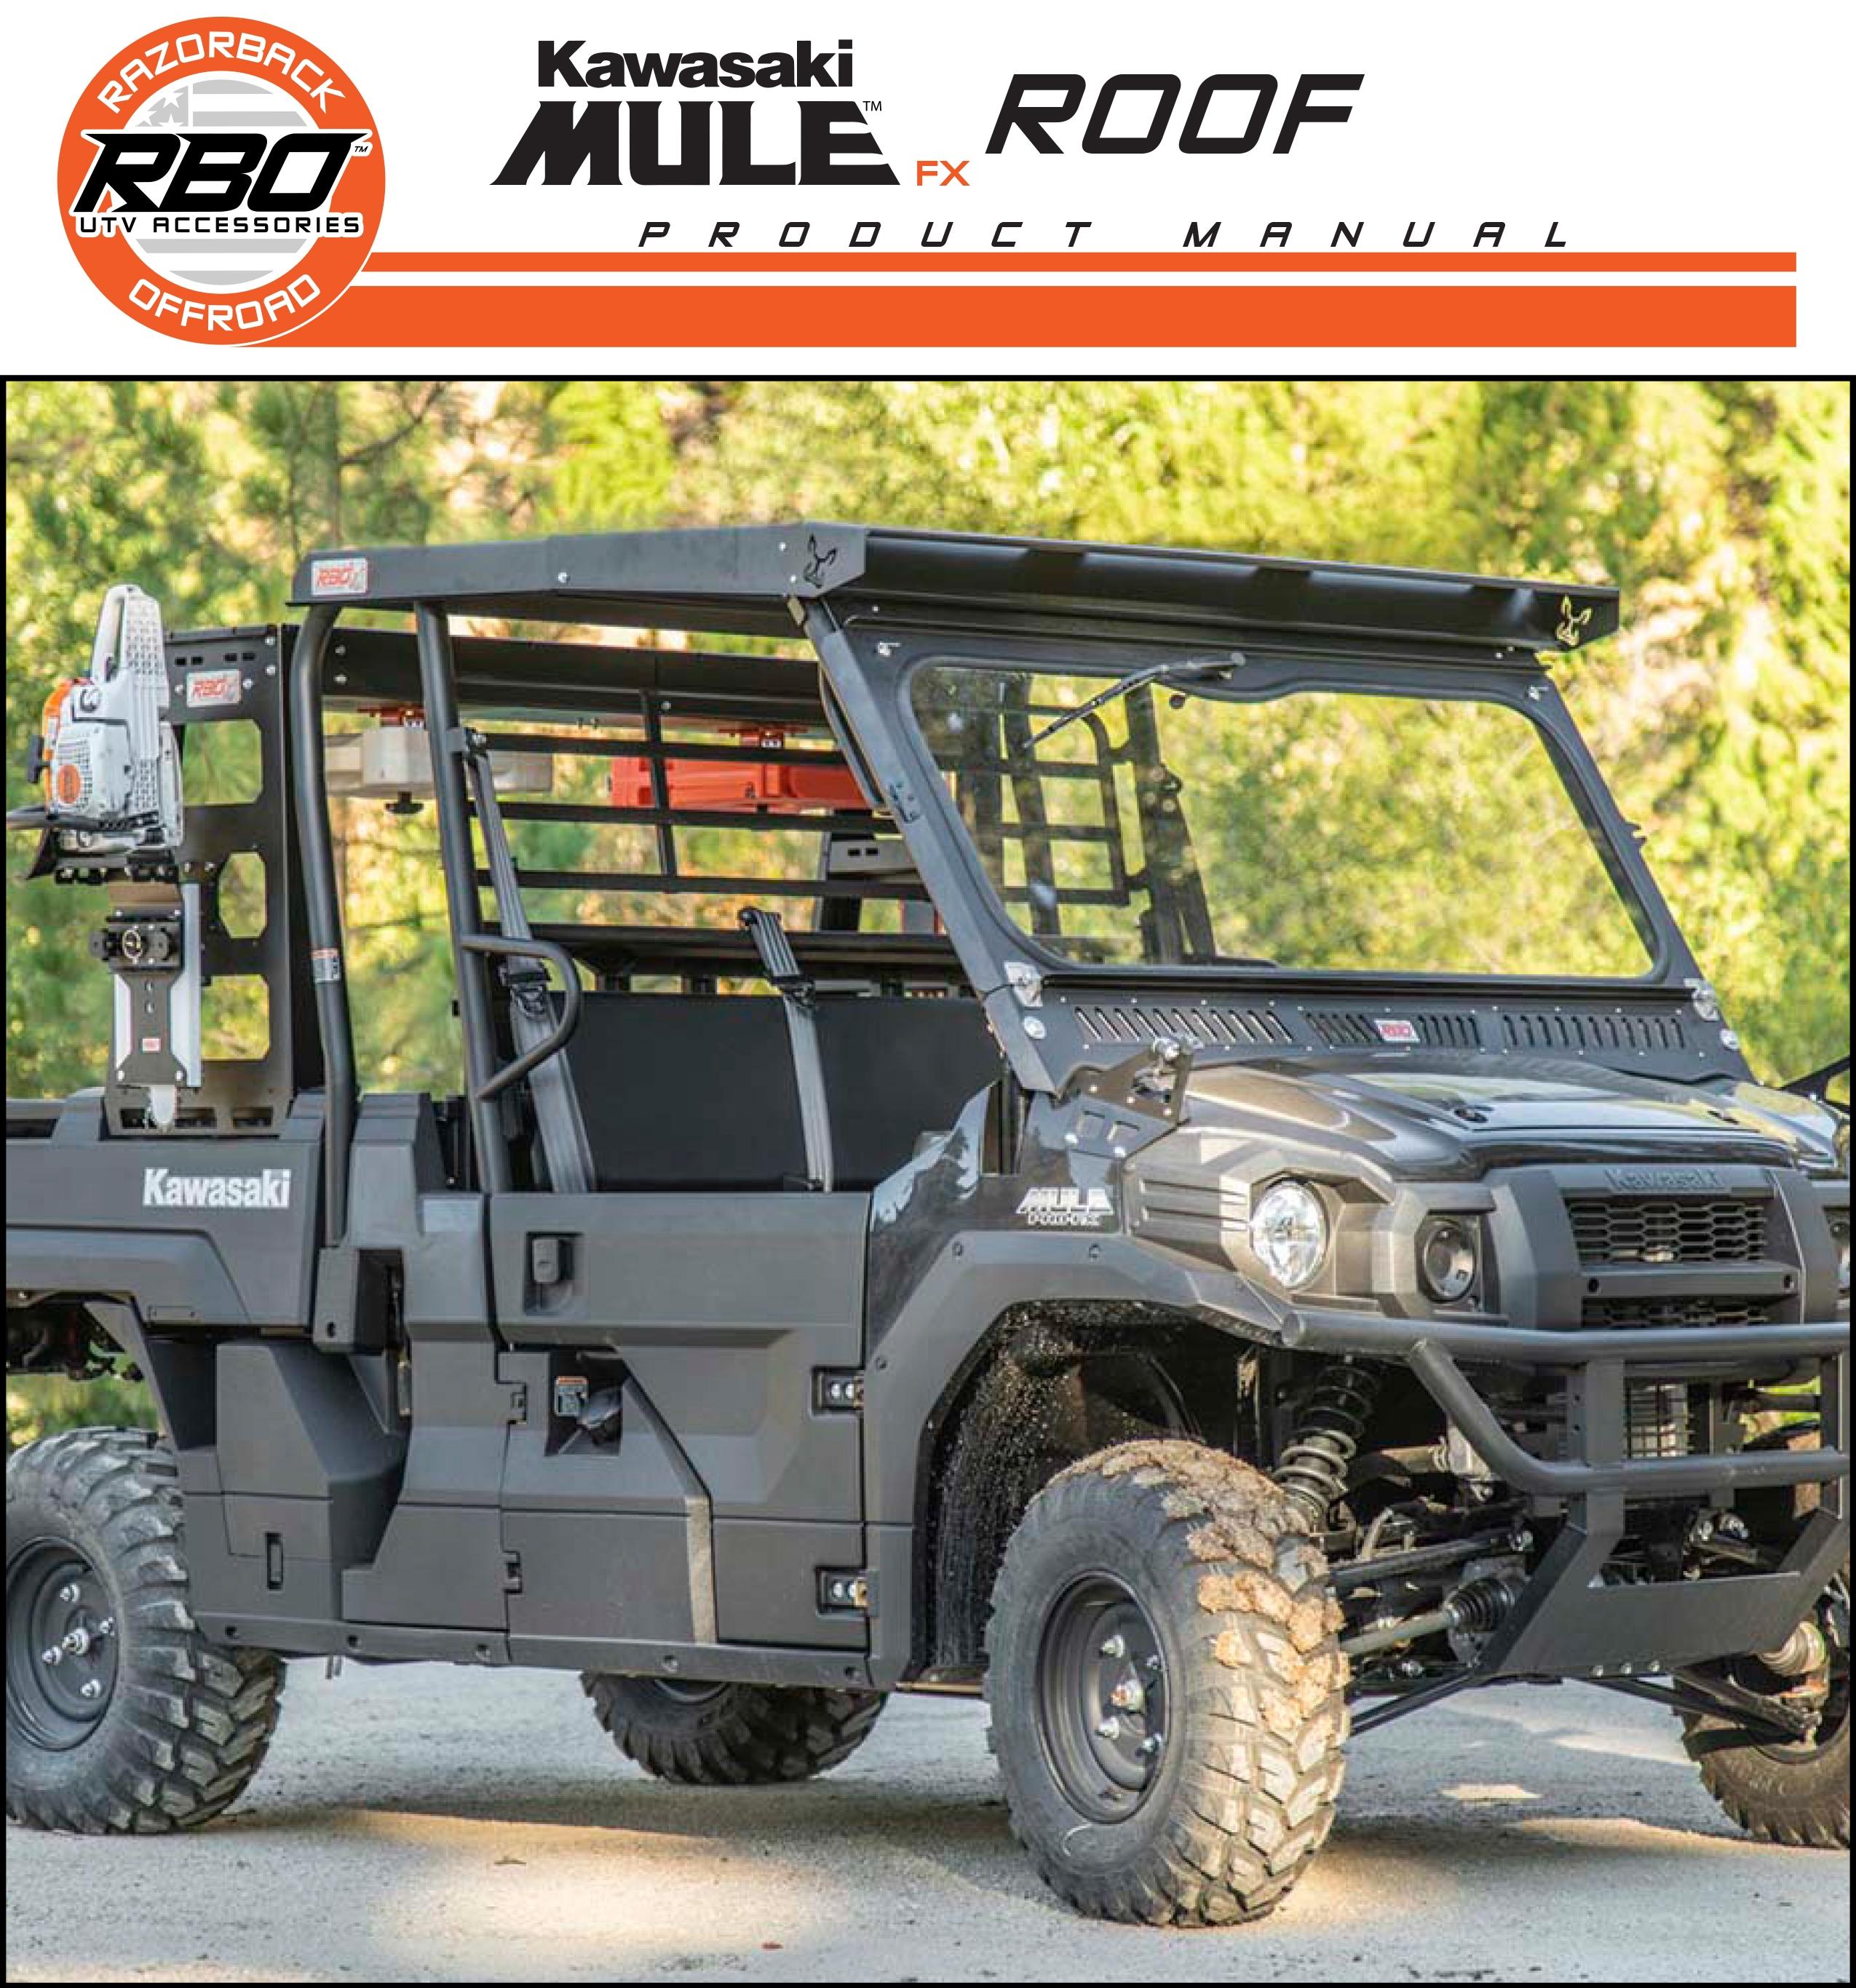 RBO Kawasaki Mule FX Roof Product Manual